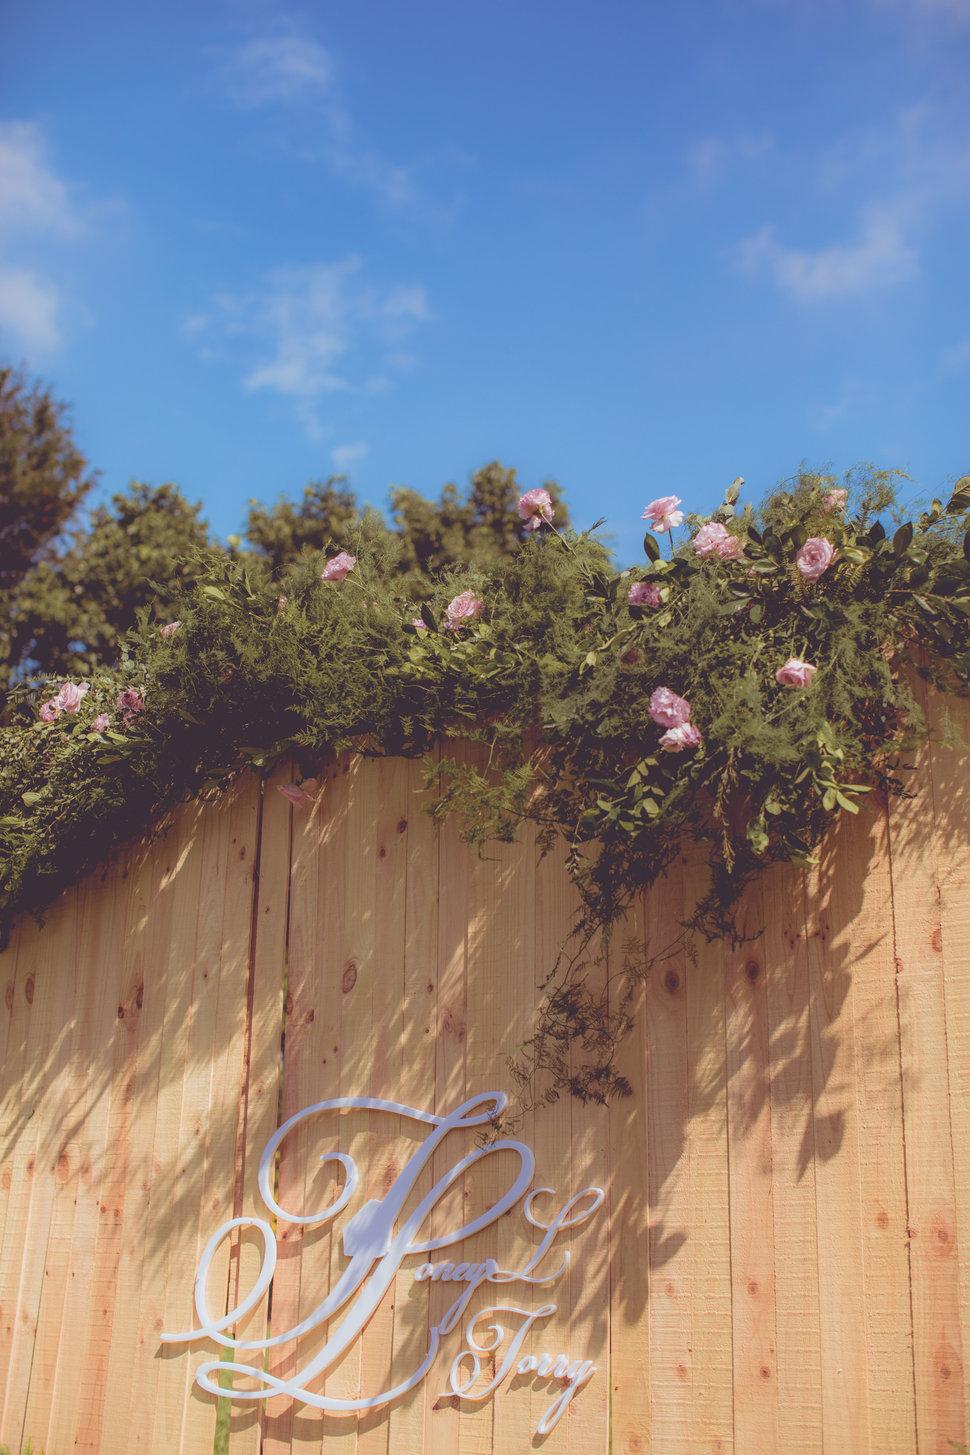 桃園自宅(編號:429157) - Tree Photography - 結婚吧